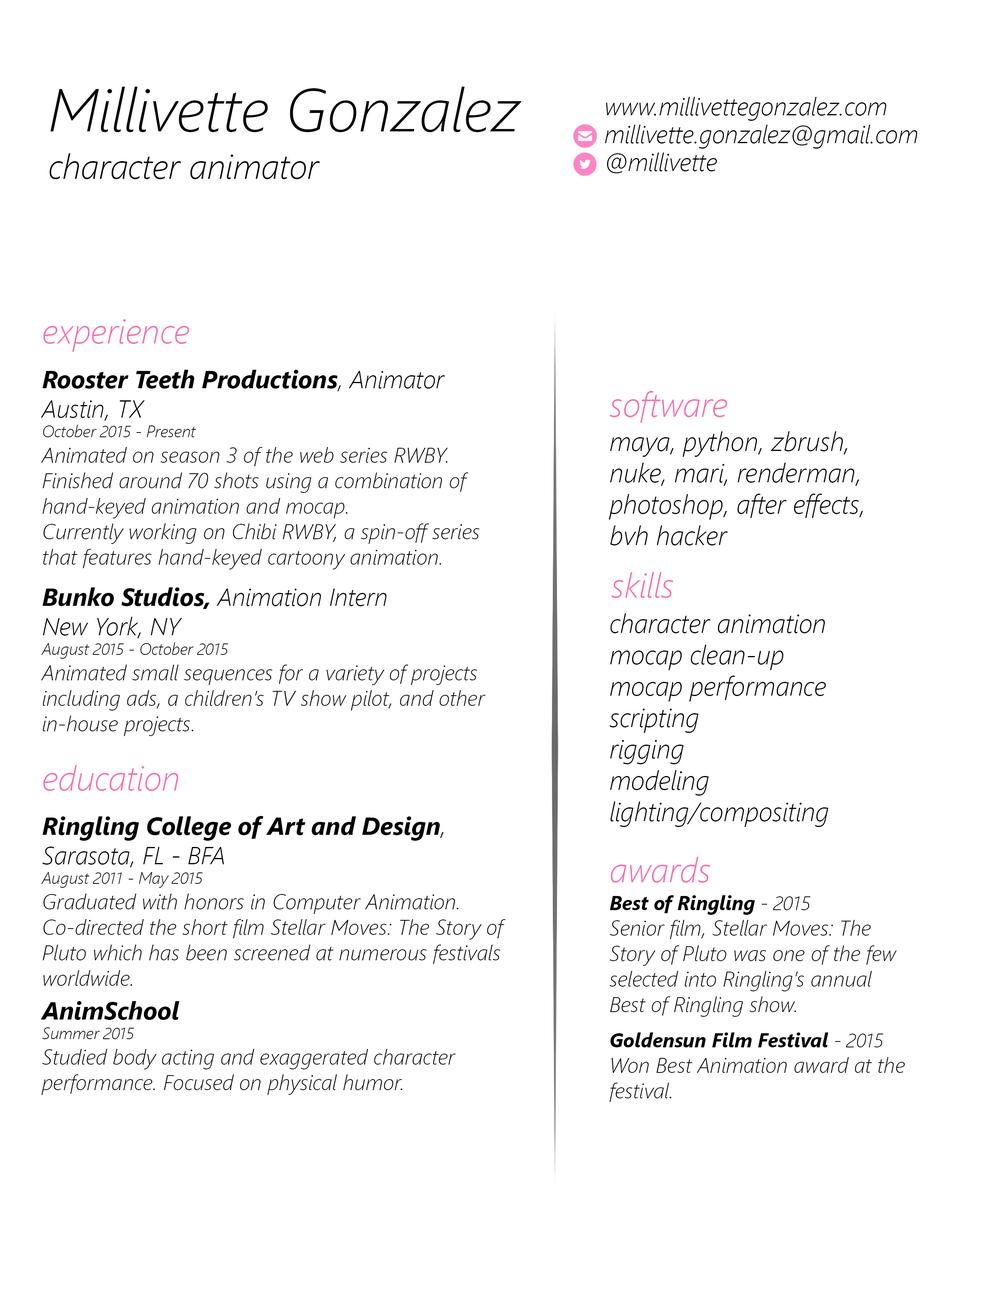 MillivetteGonzalez_CharacterAnimation_resume2015.jpg